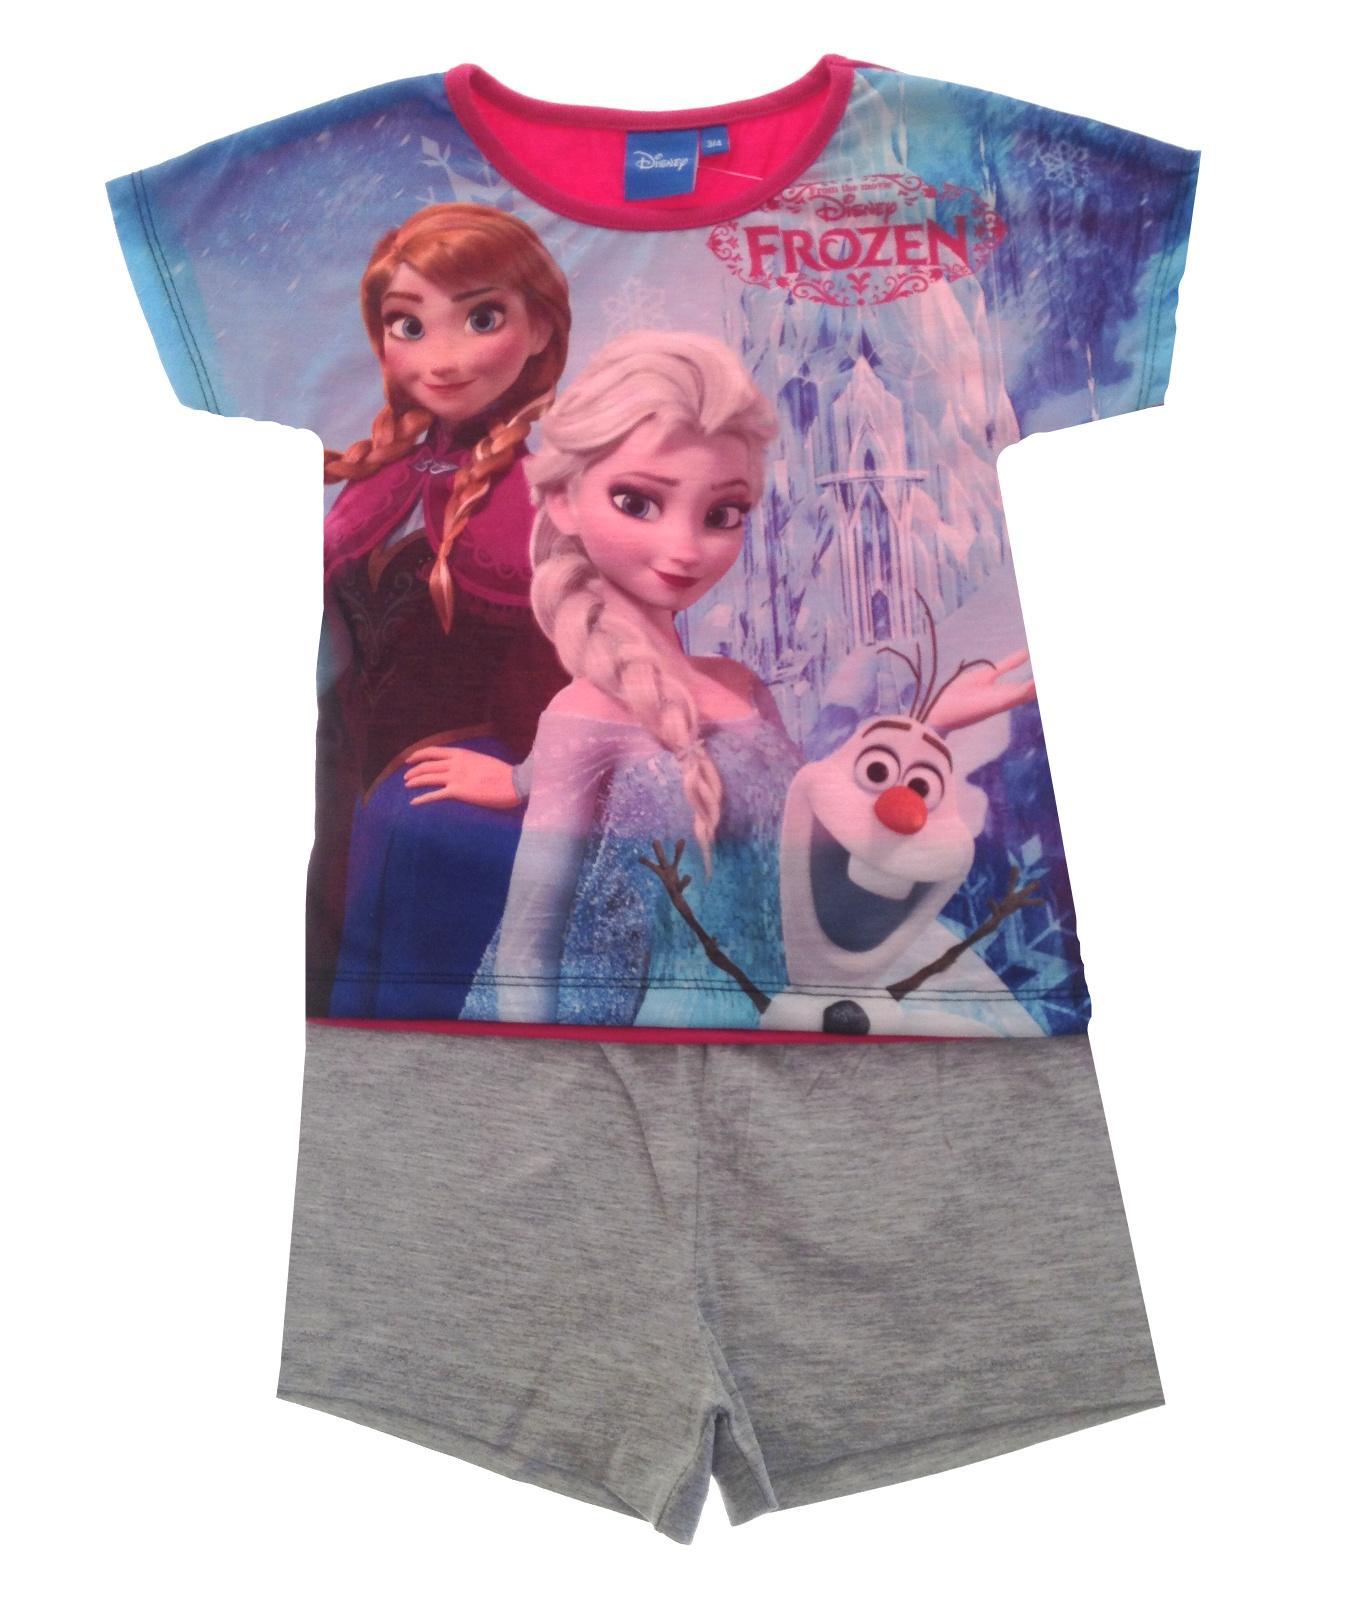 9fae23631b Girls Official Disney Frozen   Sofia the First Short Pyjamas Pj s ...